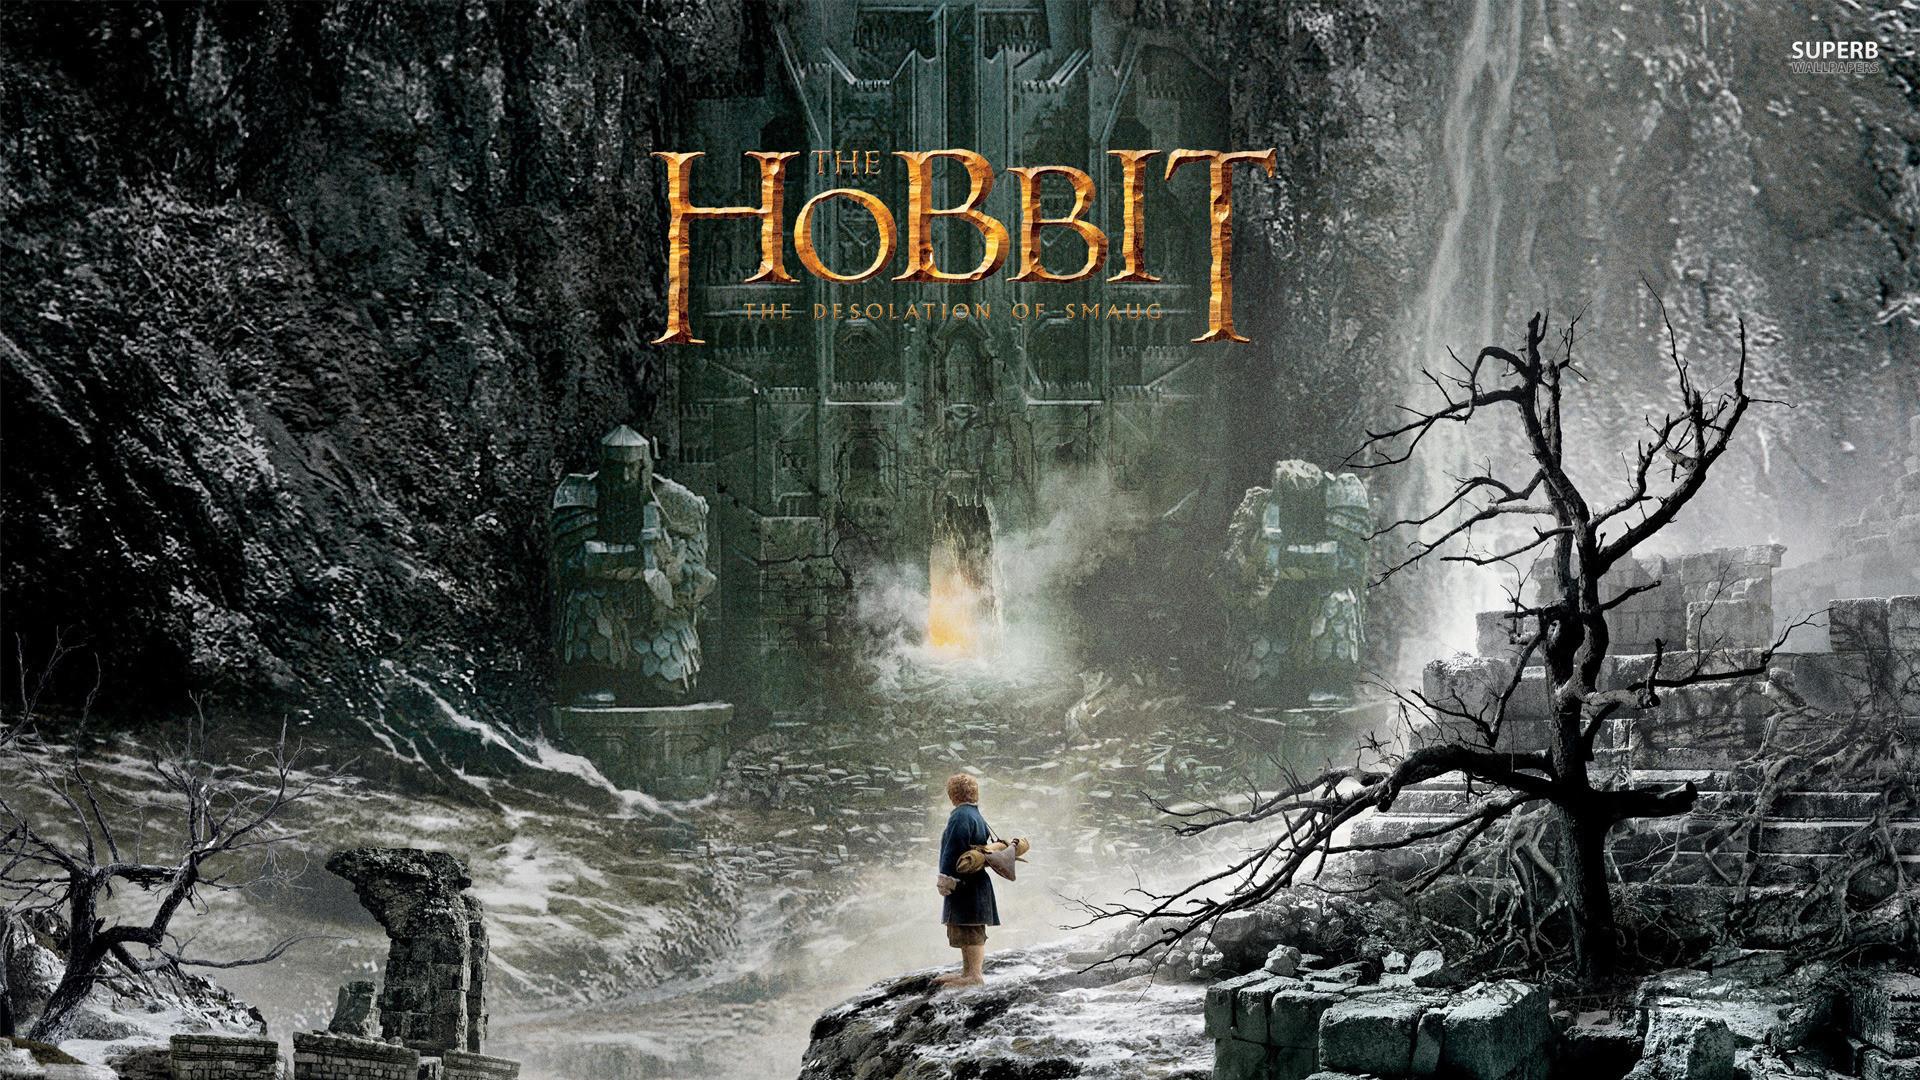 The Hobbit Movie Wallpaper (85+ images)